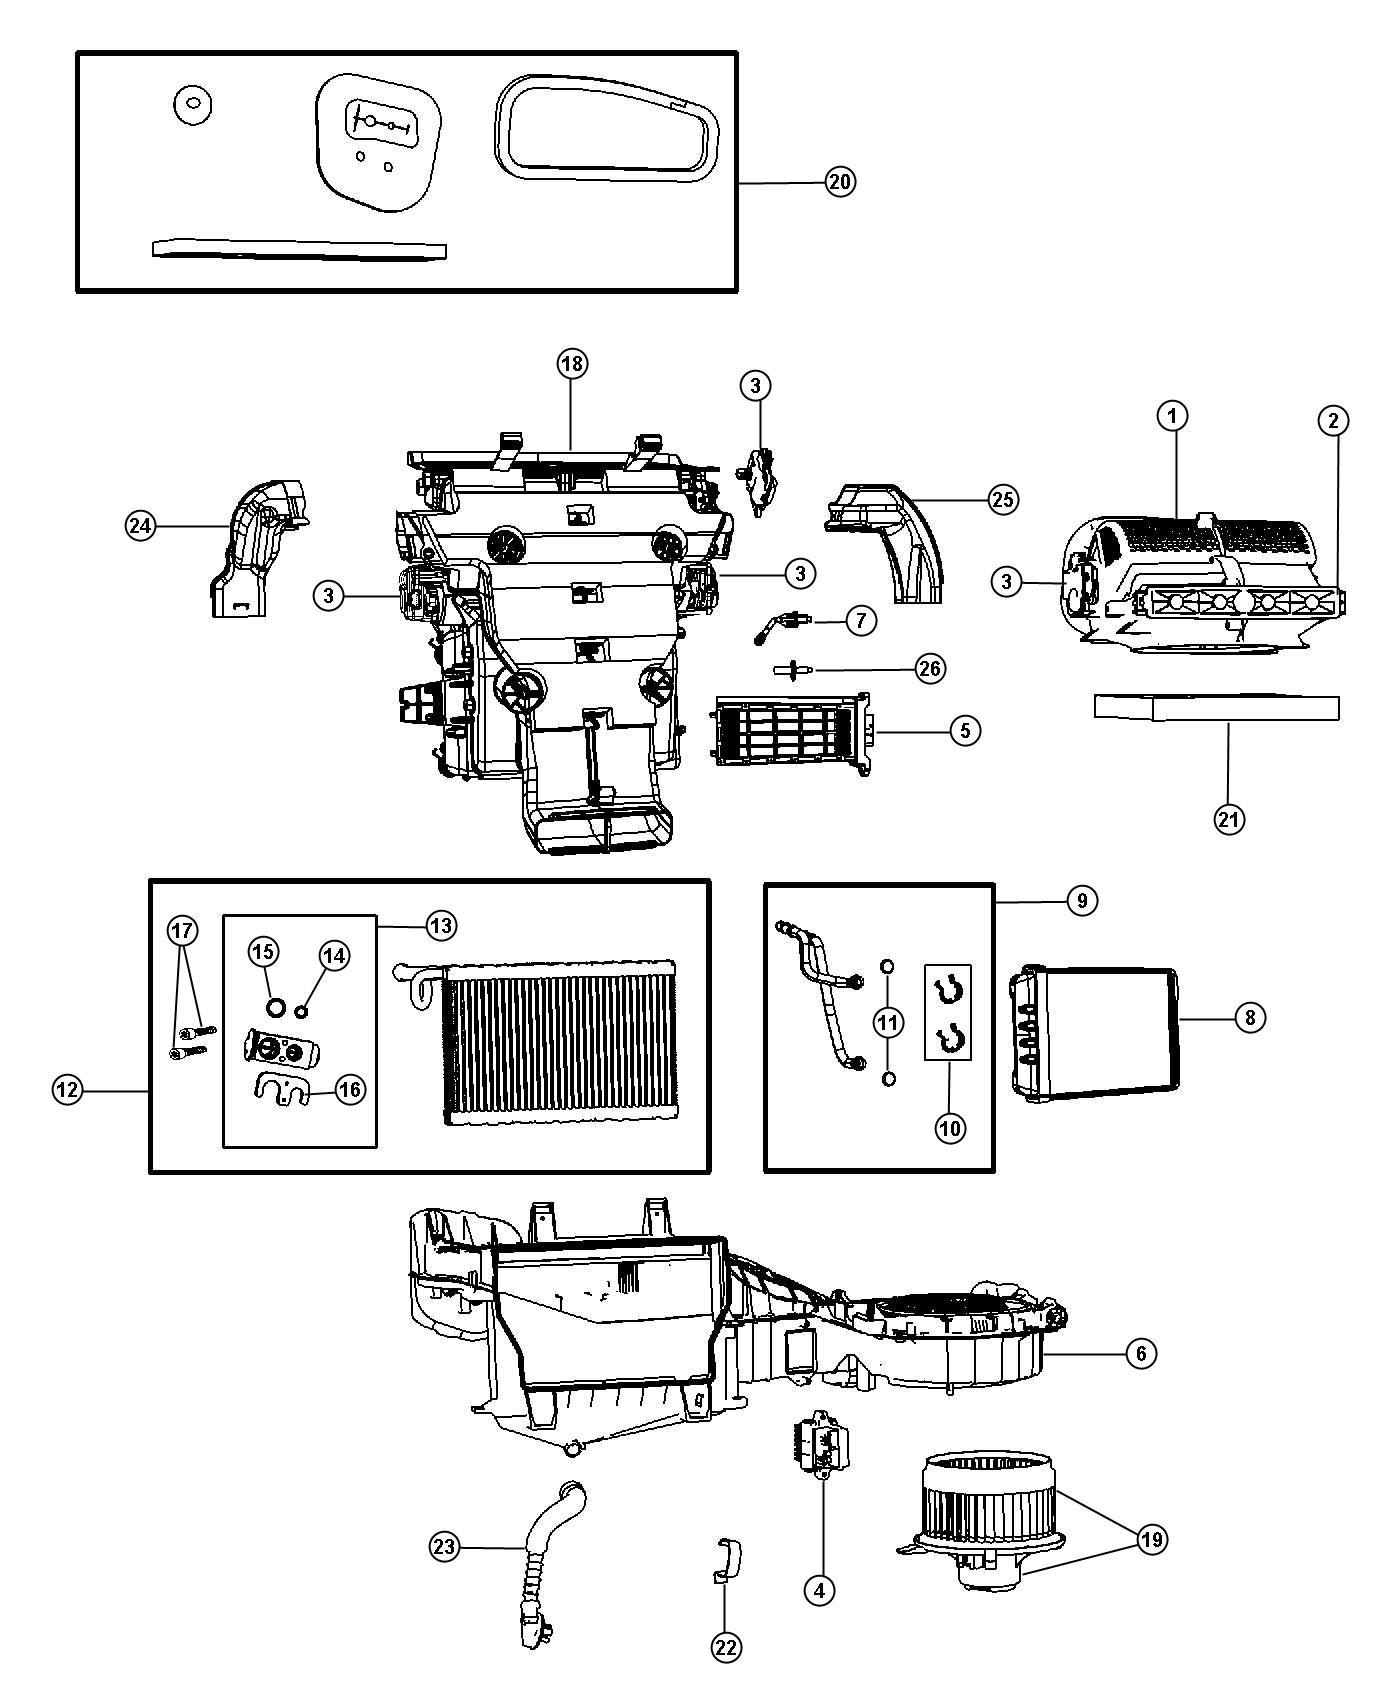 Gmc Fuse Box Wiring Diagram Schemes Sierra Blower Heater Diagrams Auto Fuse Box Diagram